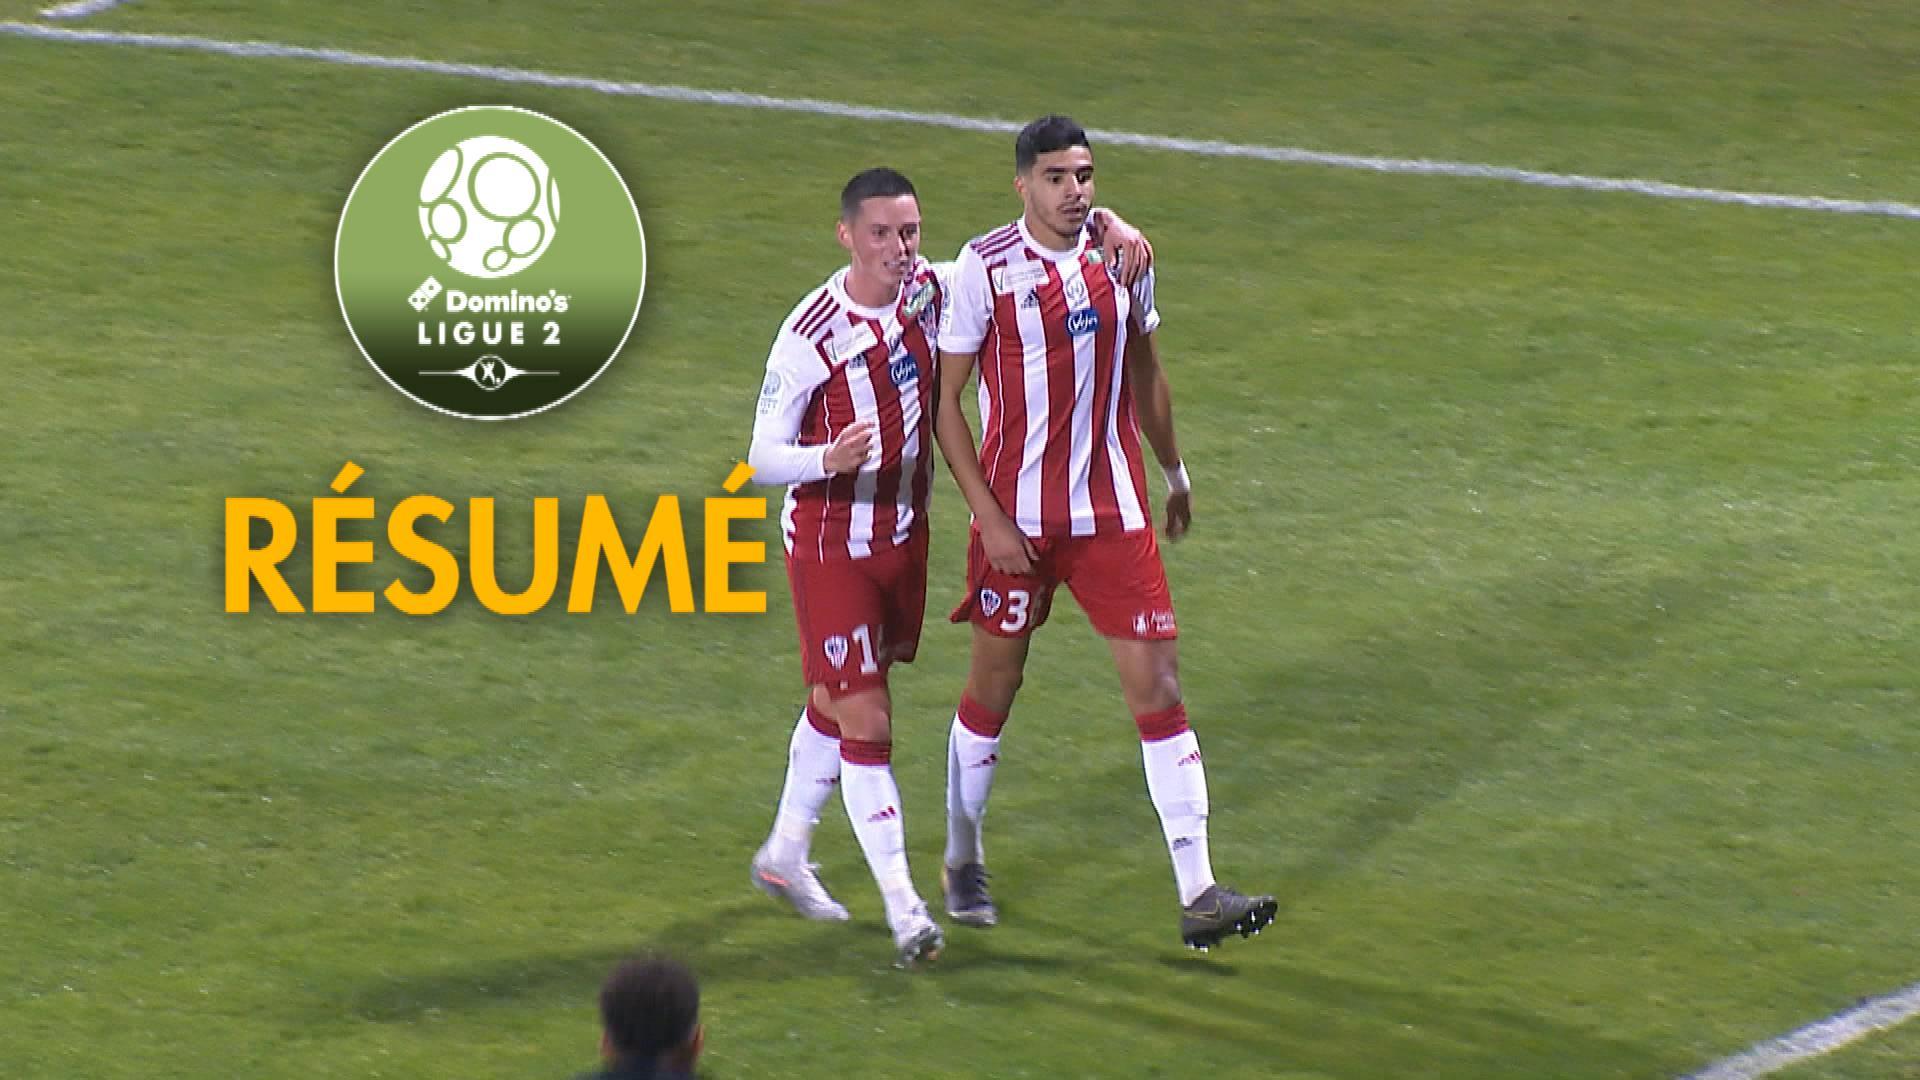 AC Ajaccio - Grenoble Foot 38 (3-1)  - Résumé - (ACA-GF38) / 2019-20